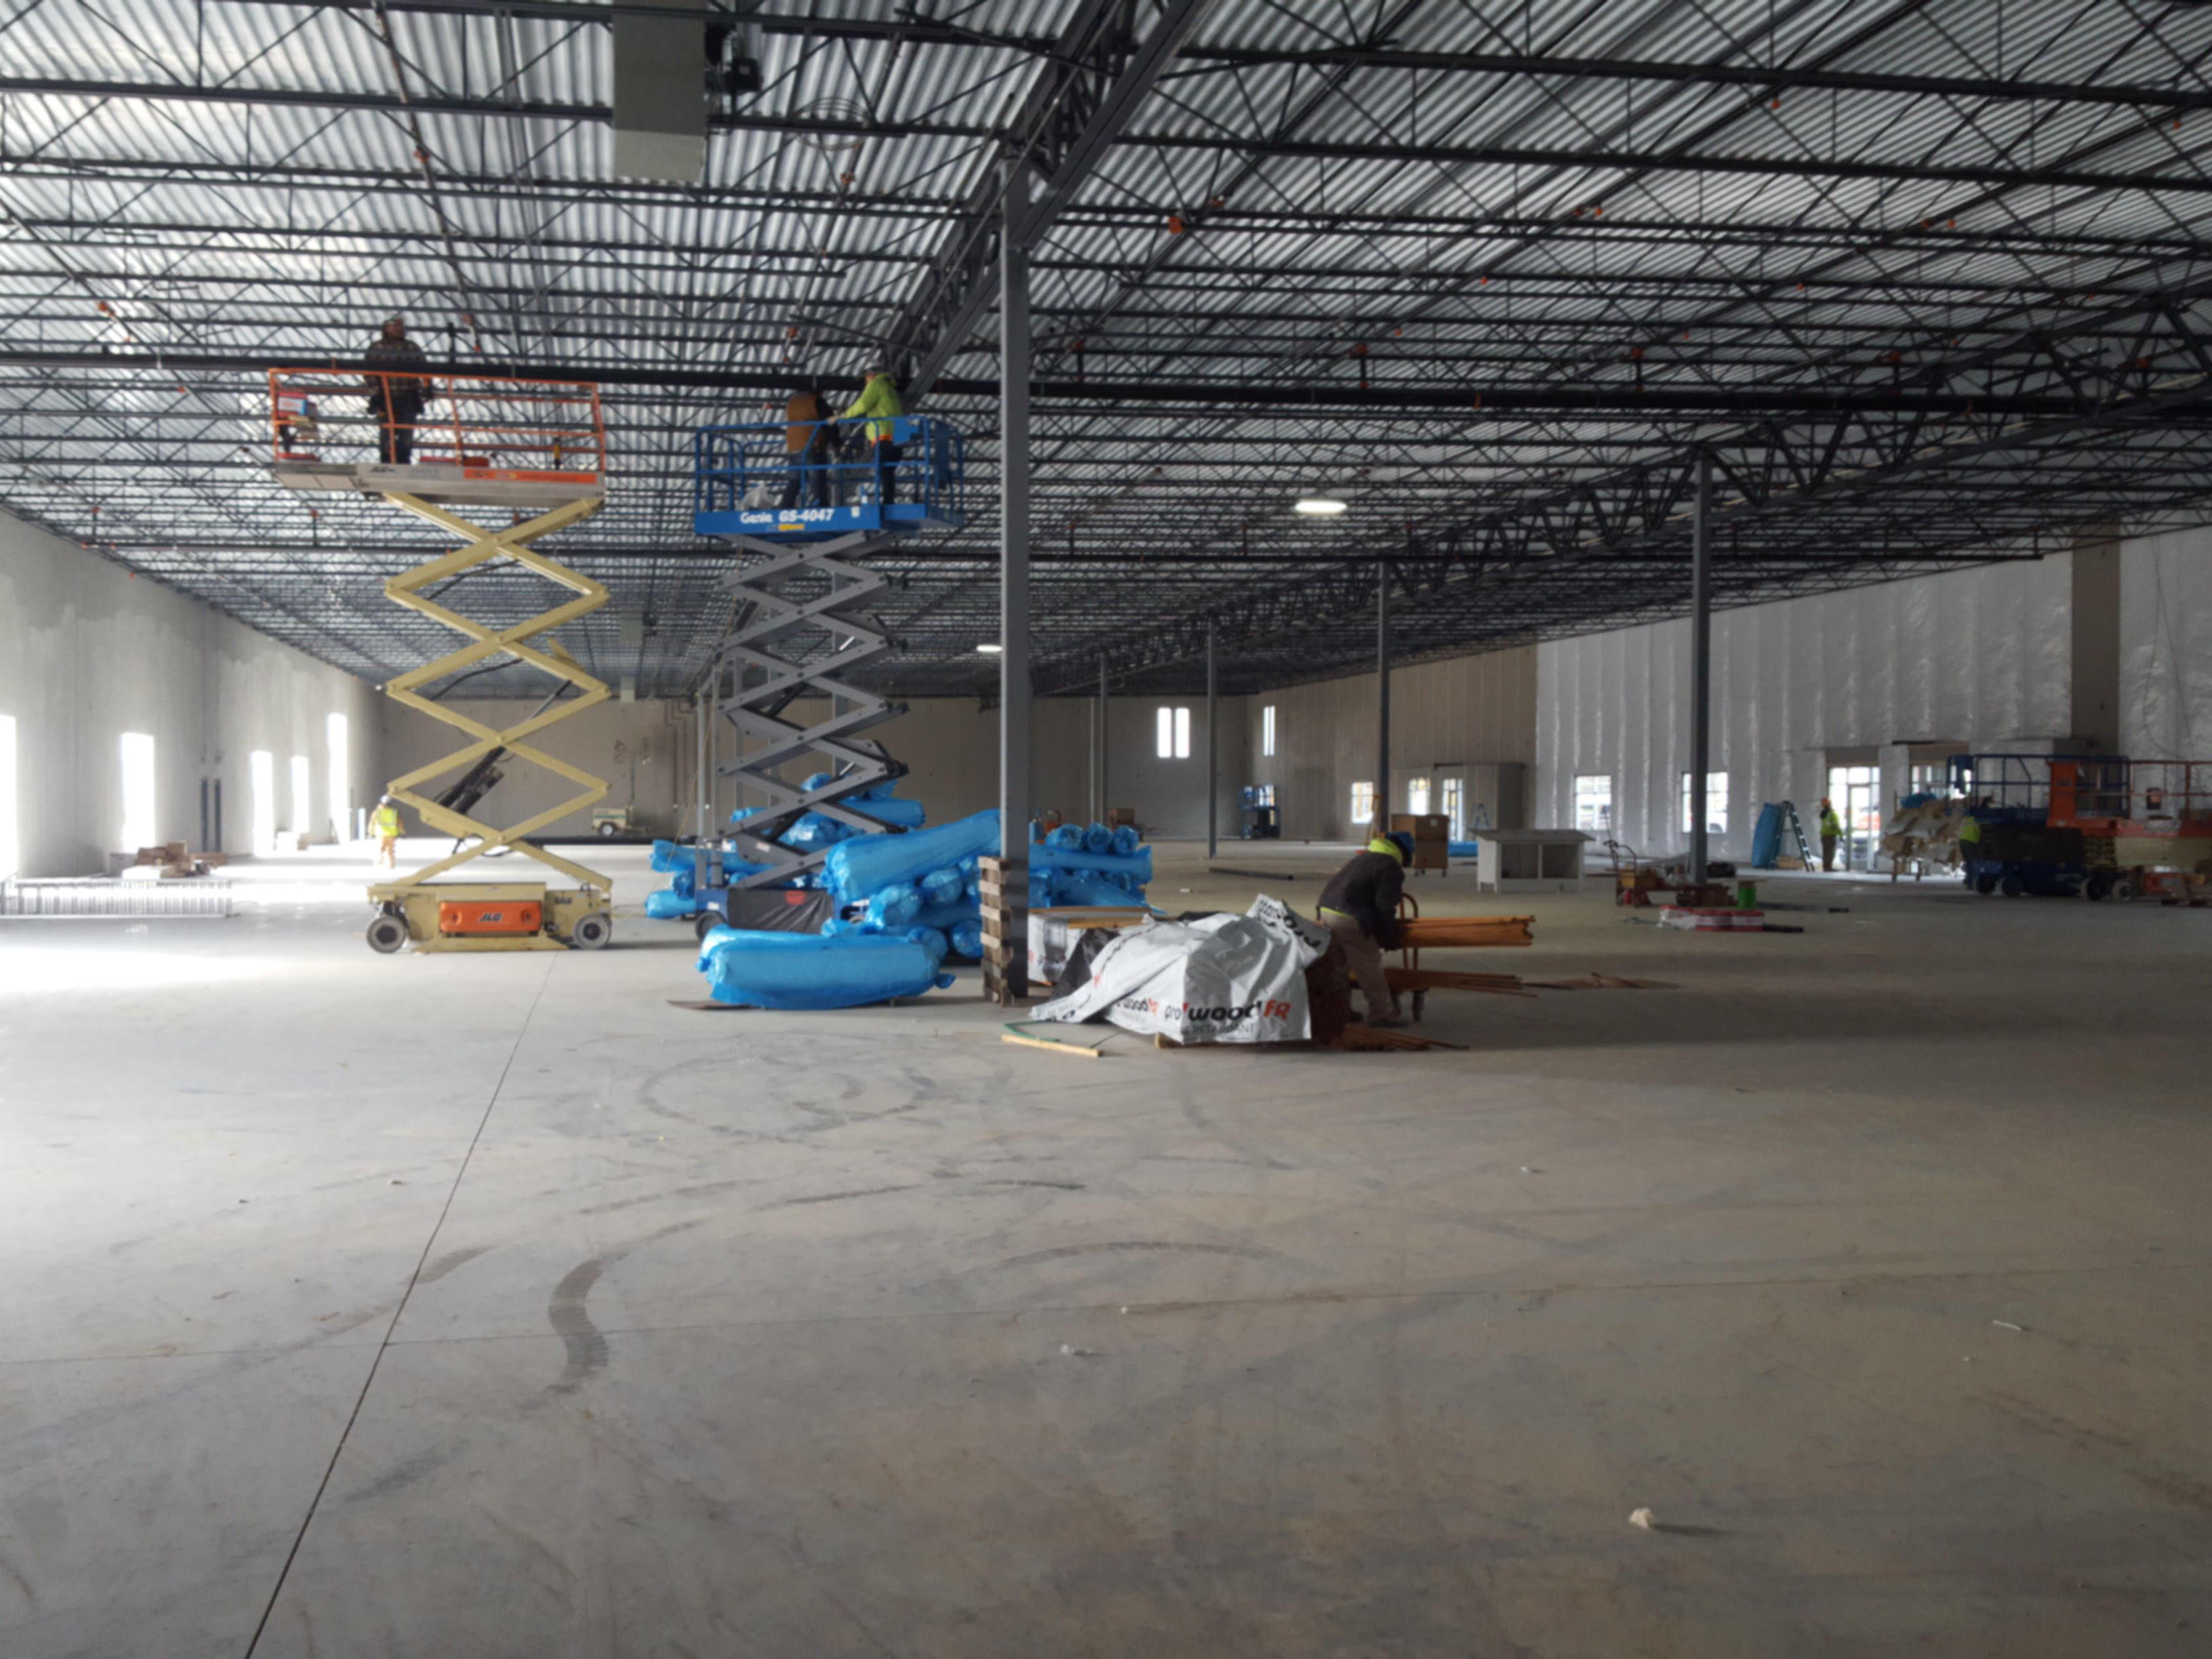 Lot 6, interior, last mile delivery, industrial warehouse building, Hebron, KY